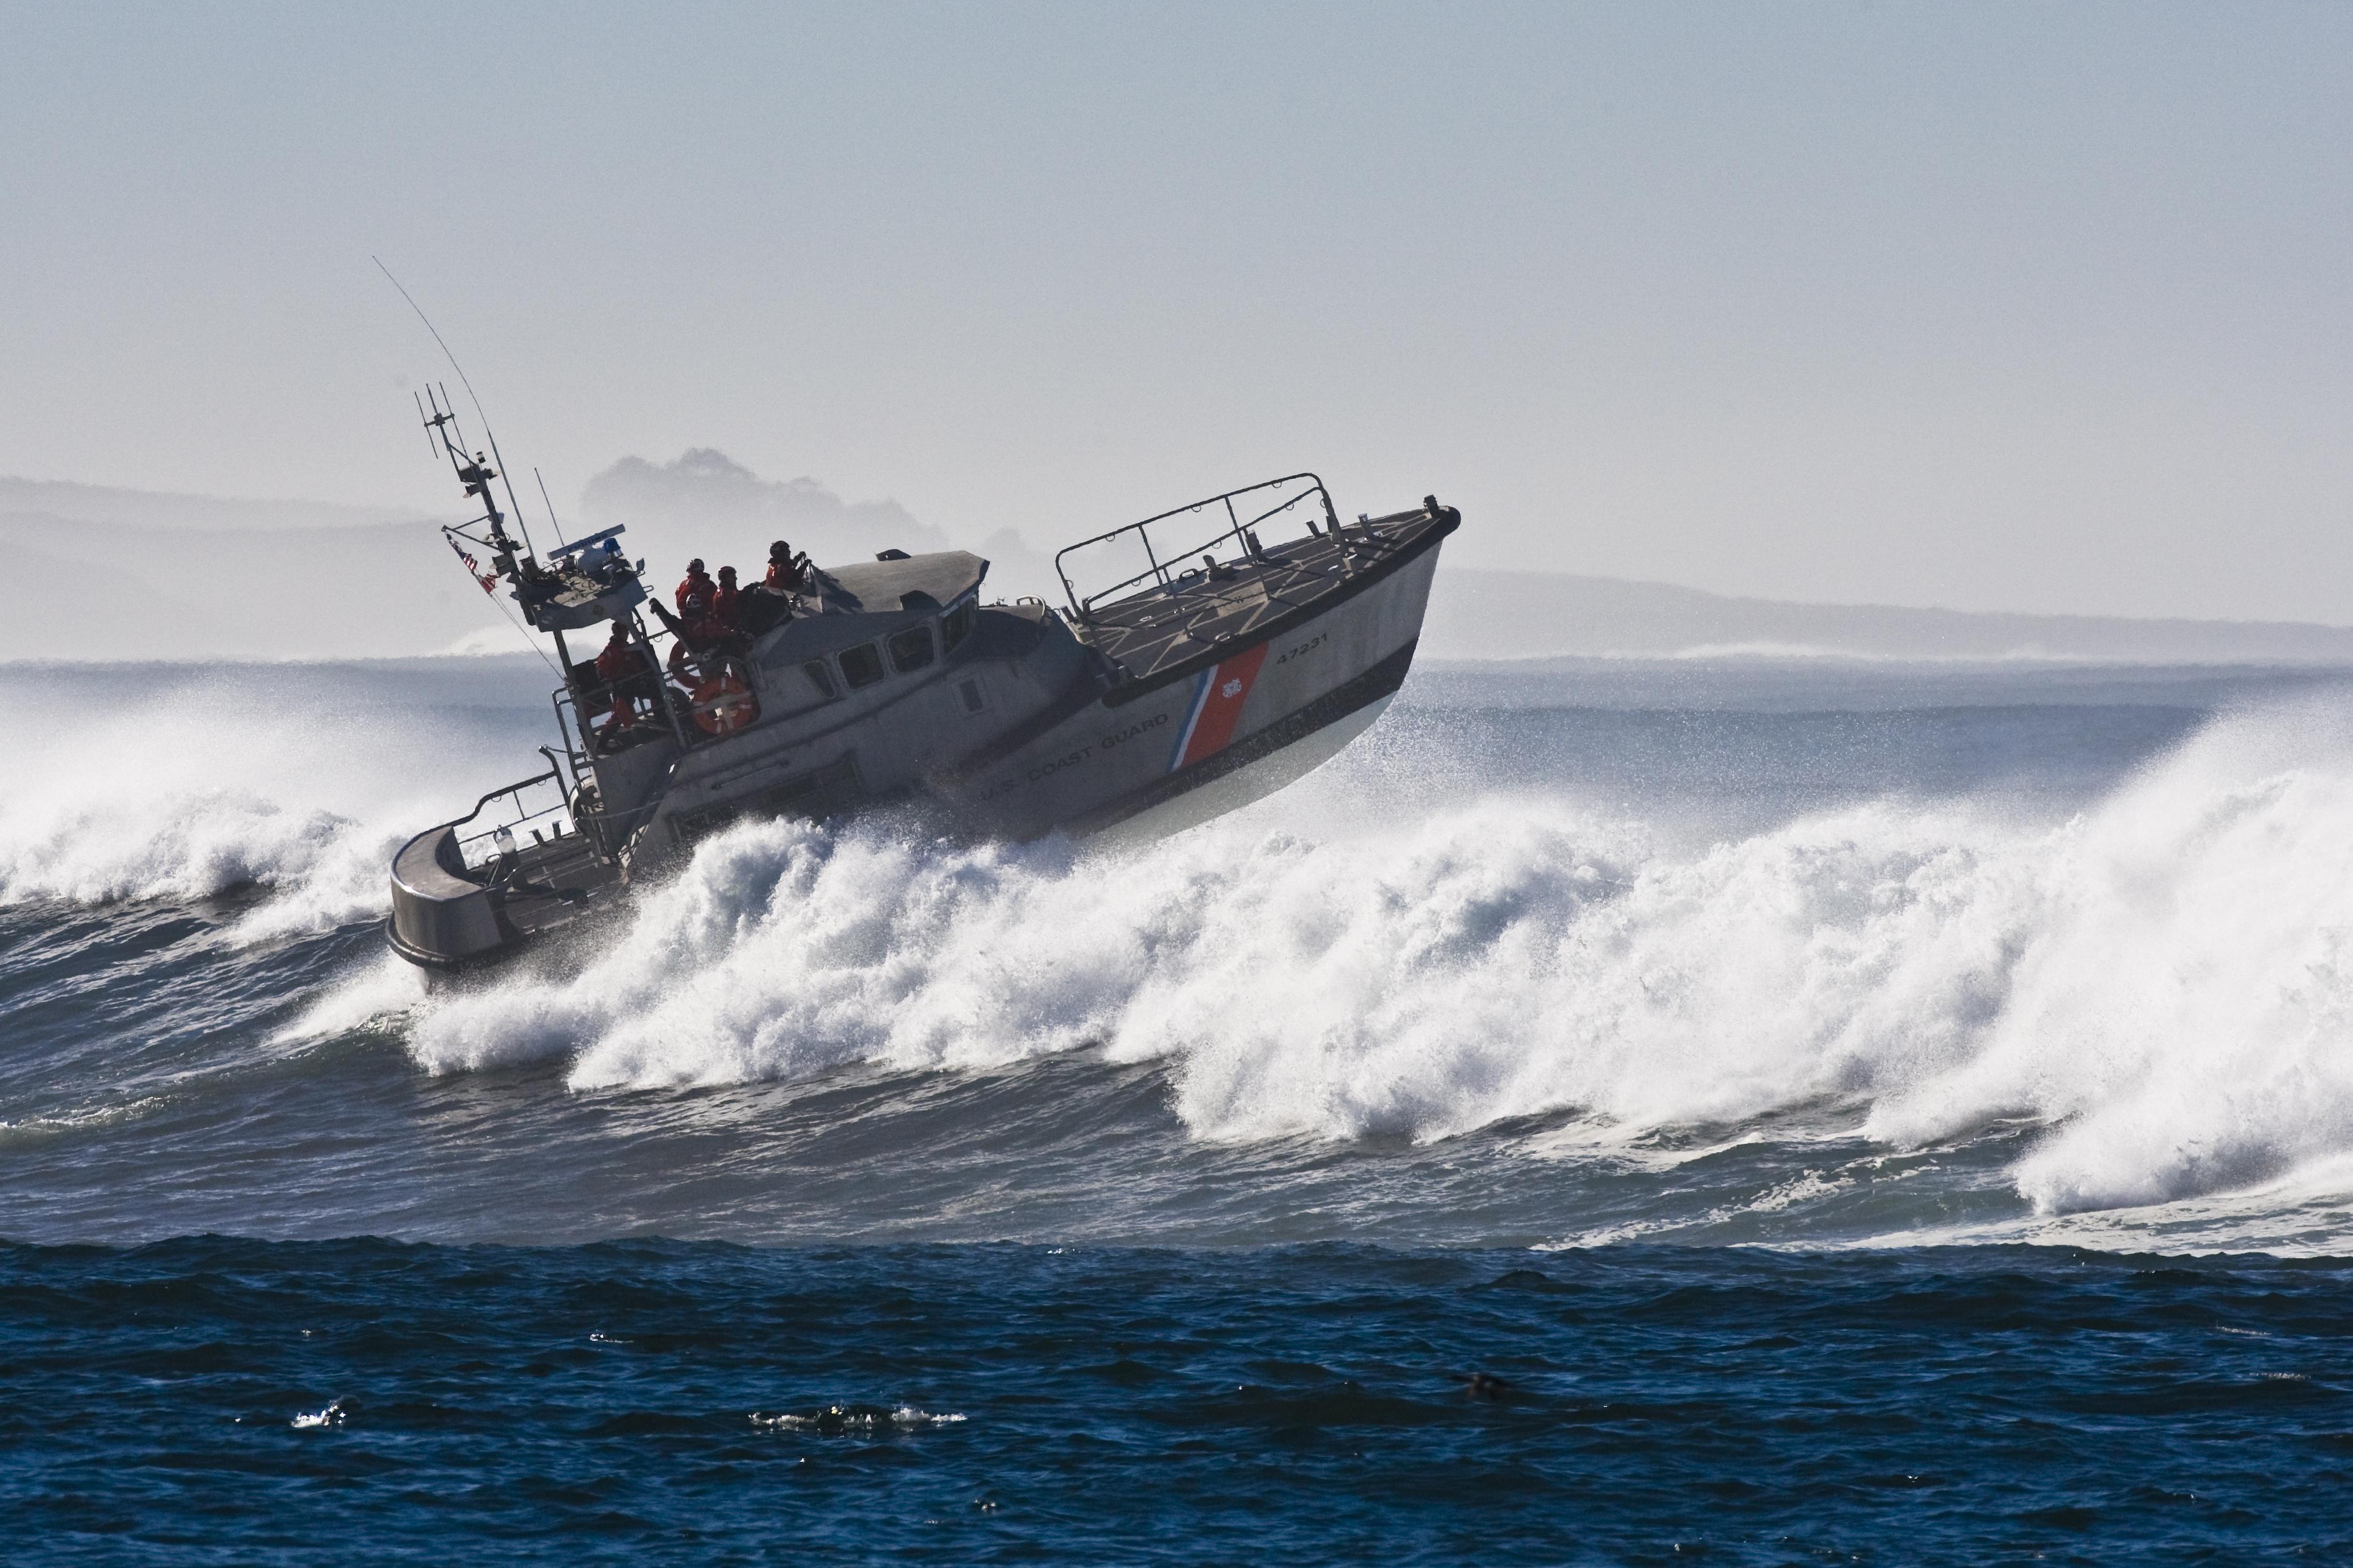 47-foot Motor Lifeboat - Wikipedia